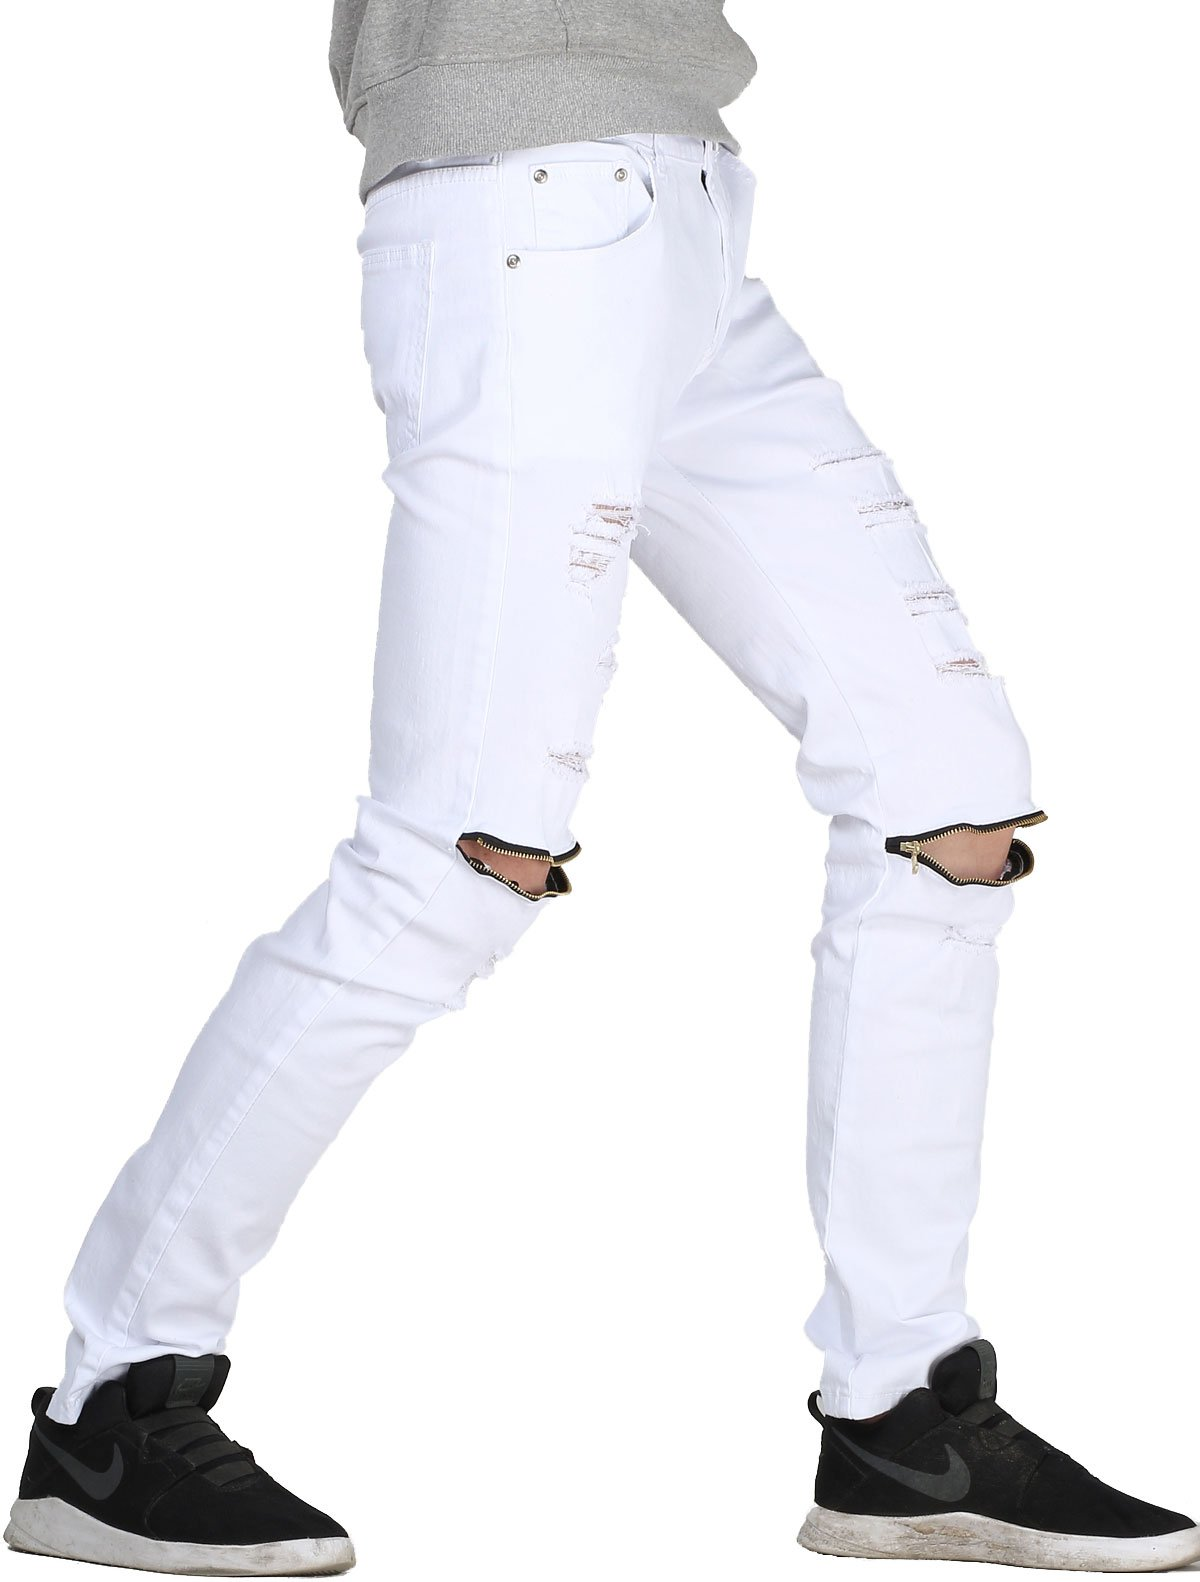 Lavnis Men's Slim Fit Destroyed Jeans with Holes Pencil Pants Slim Zipper Jeans with Holes Style 1 White-32